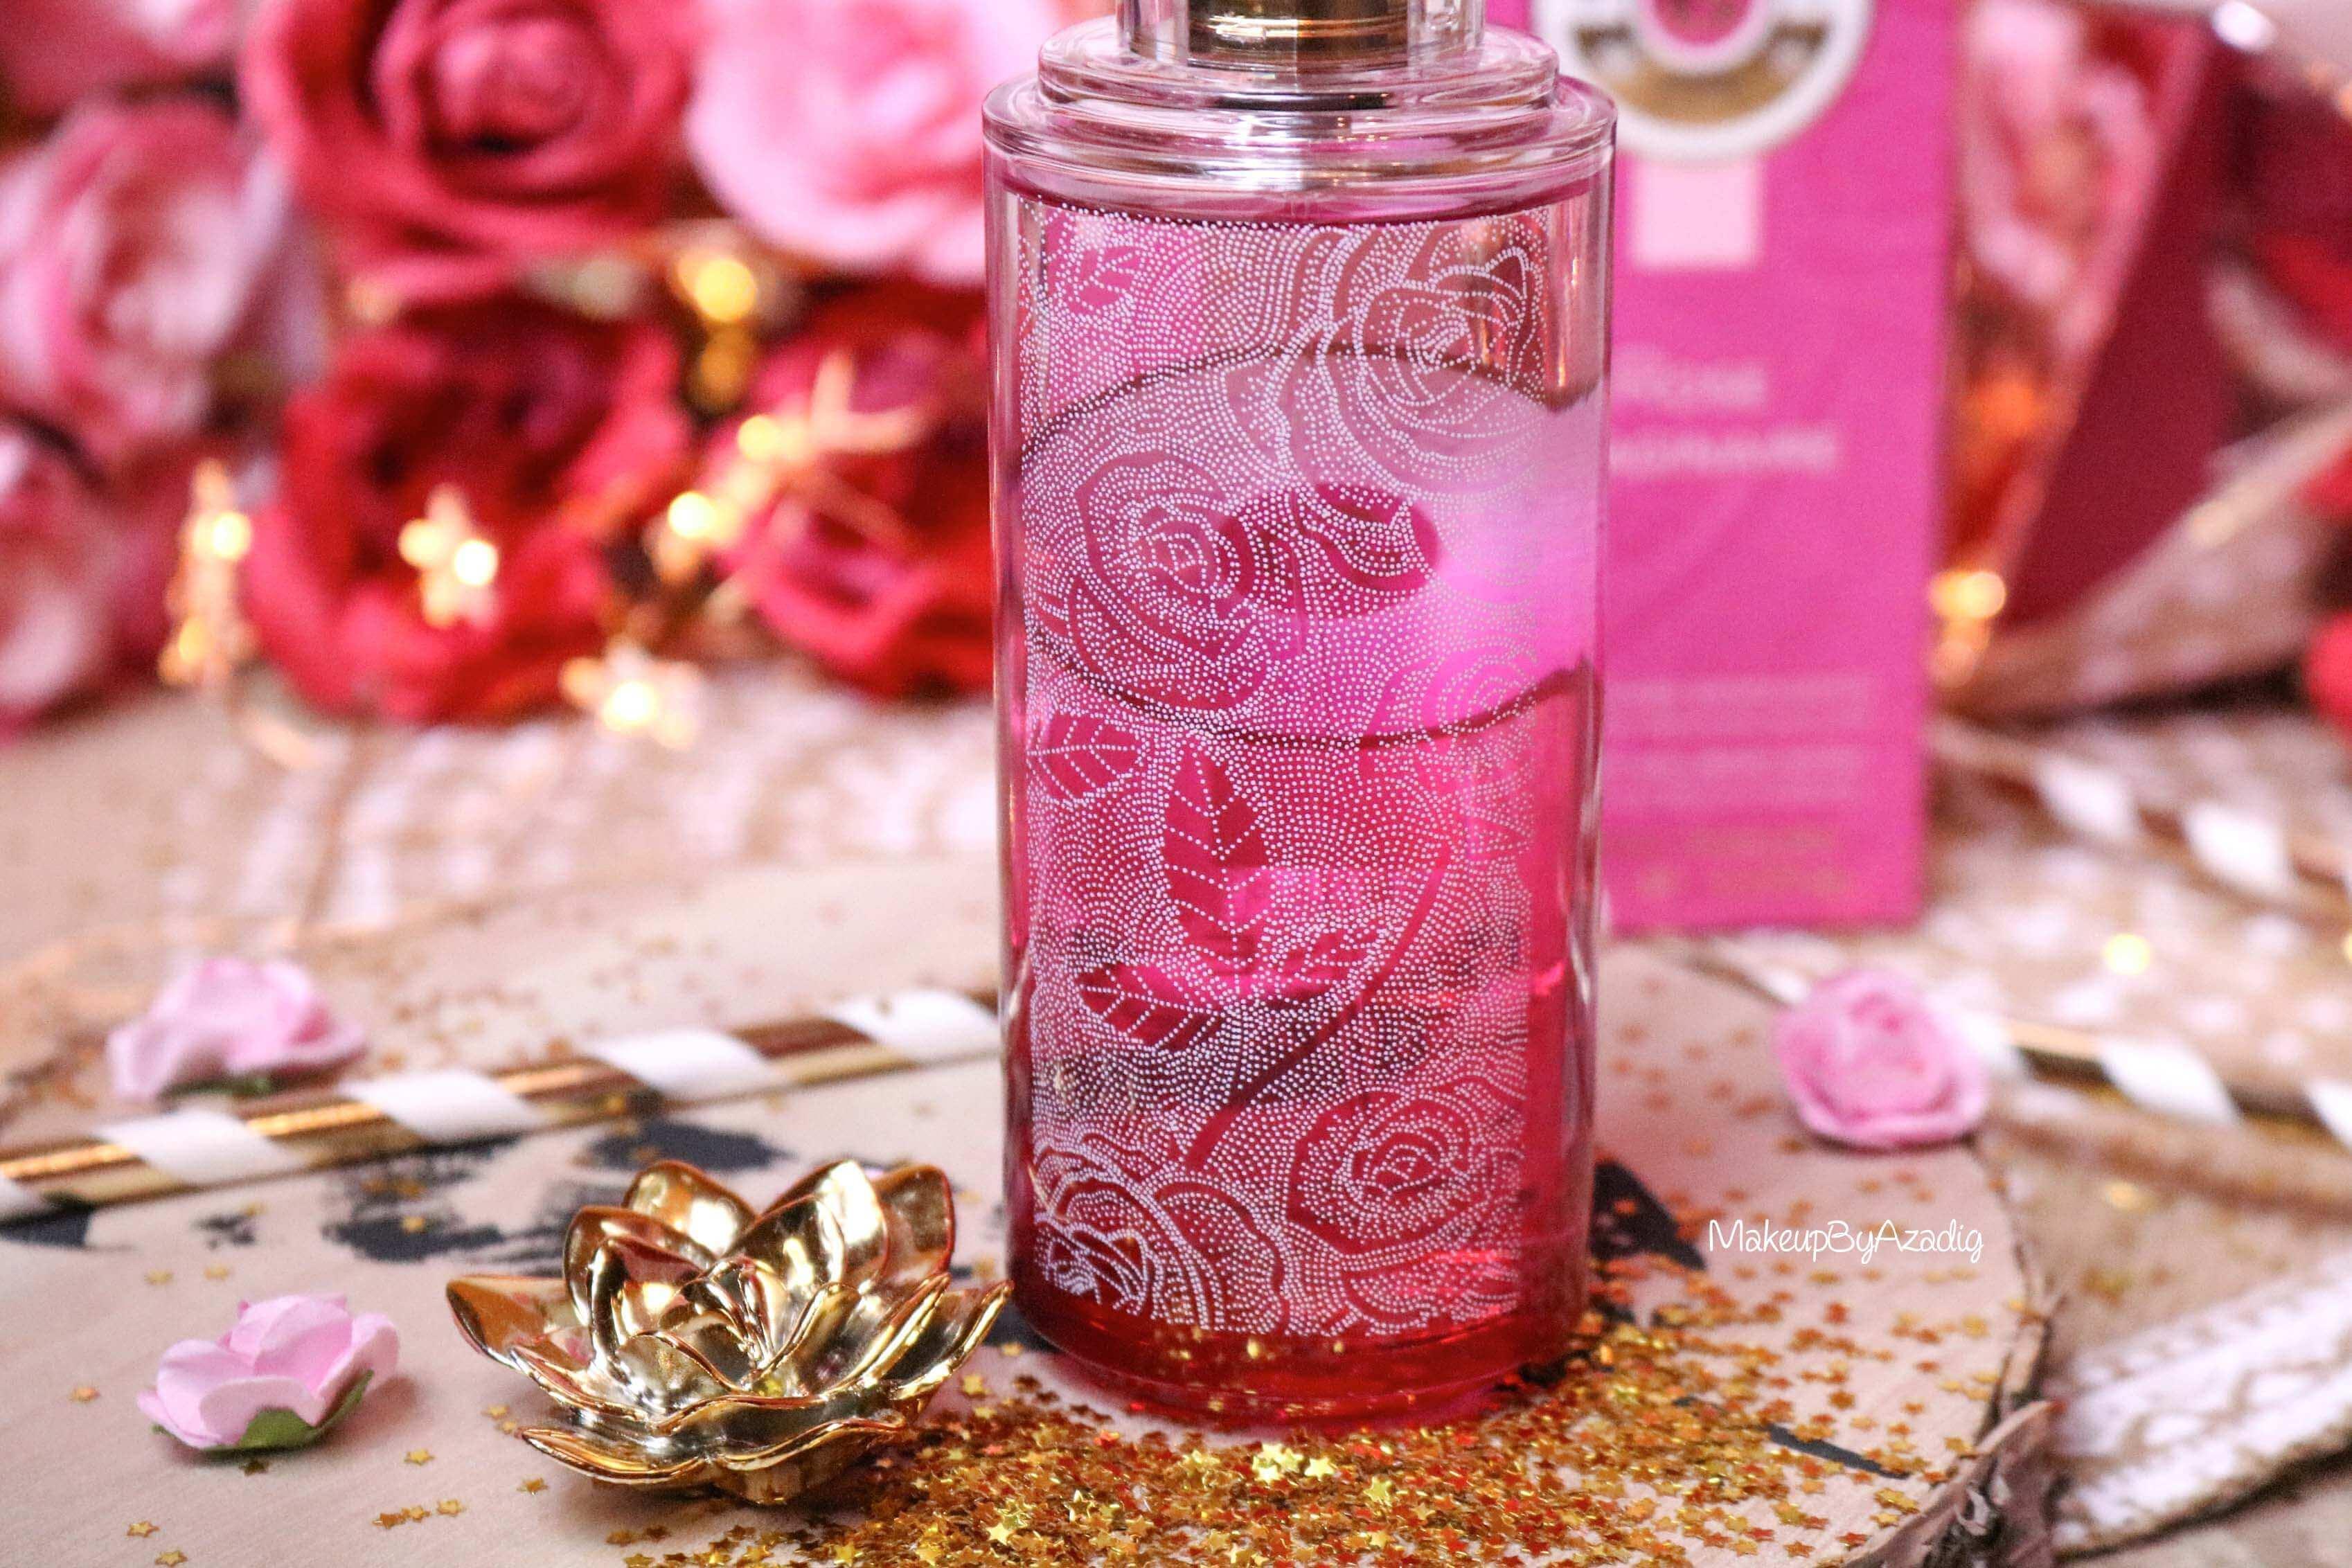 revue-eau-parfumee-bienfaisante-rose-imaginaire-roger-gallet-makeupbyazadig-parfum-bonne-tenue-avis-prix-monoprix-roses